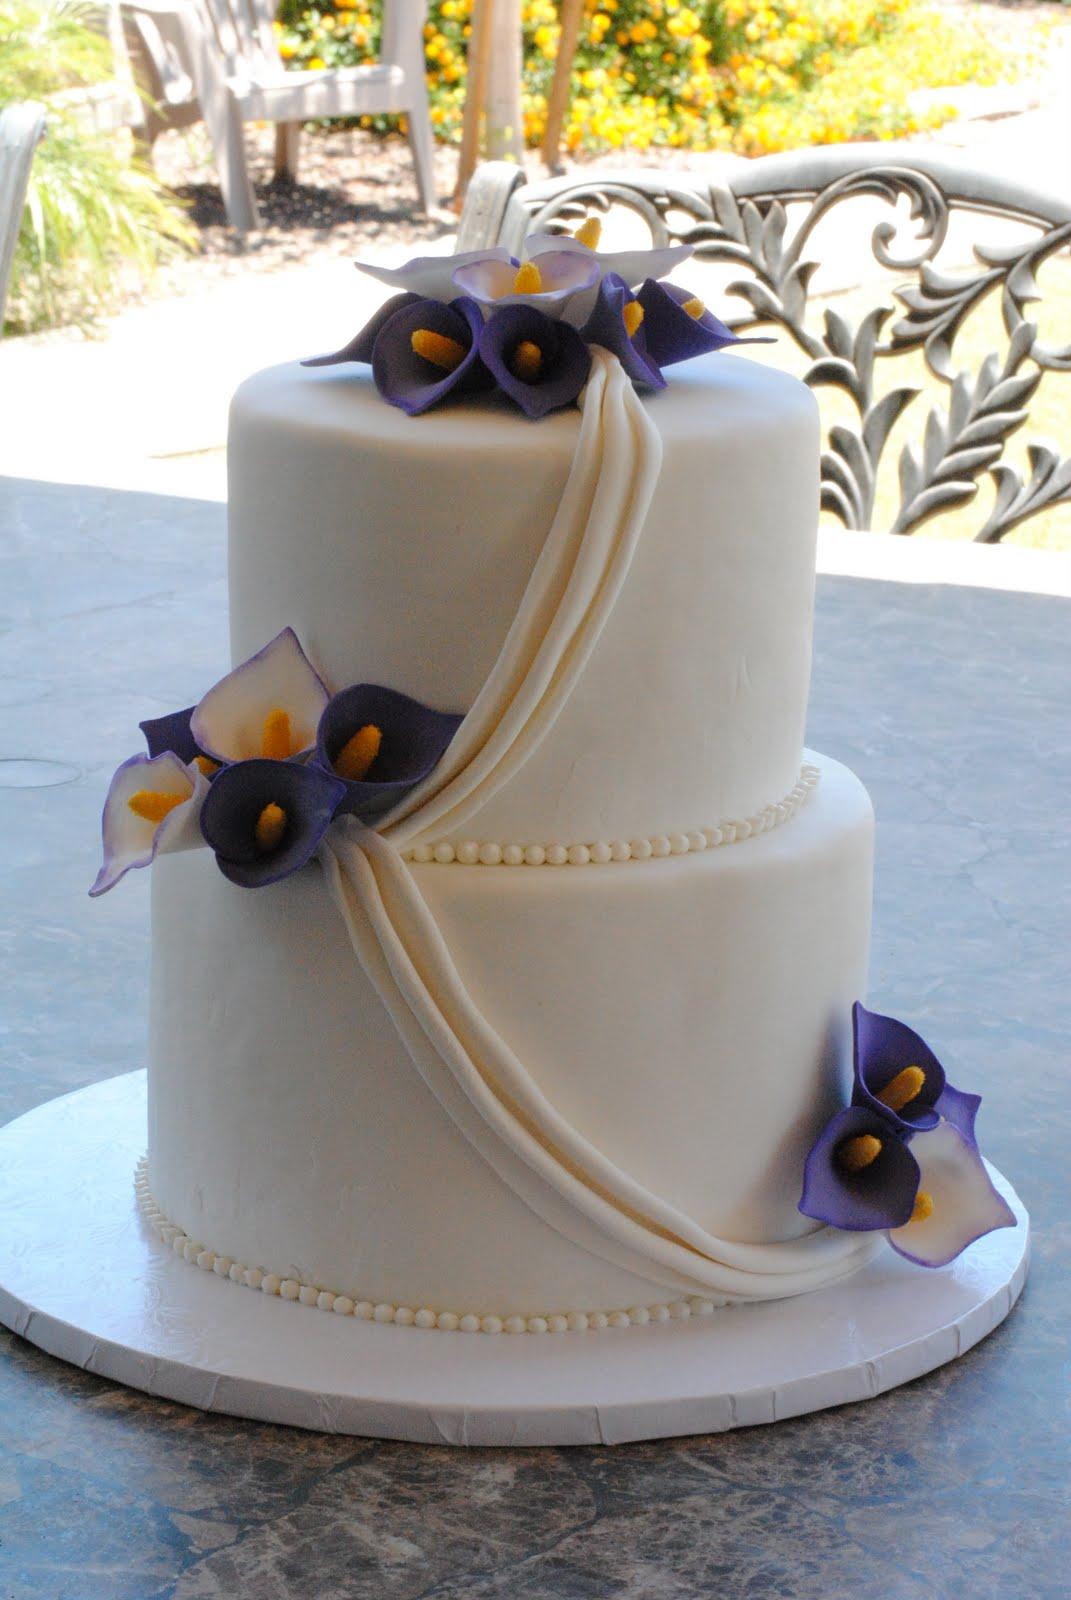 Calla Lilies Wedding Cake My FaVoriTe CaKe PlaCe - Calla Lilly Wedding Cake